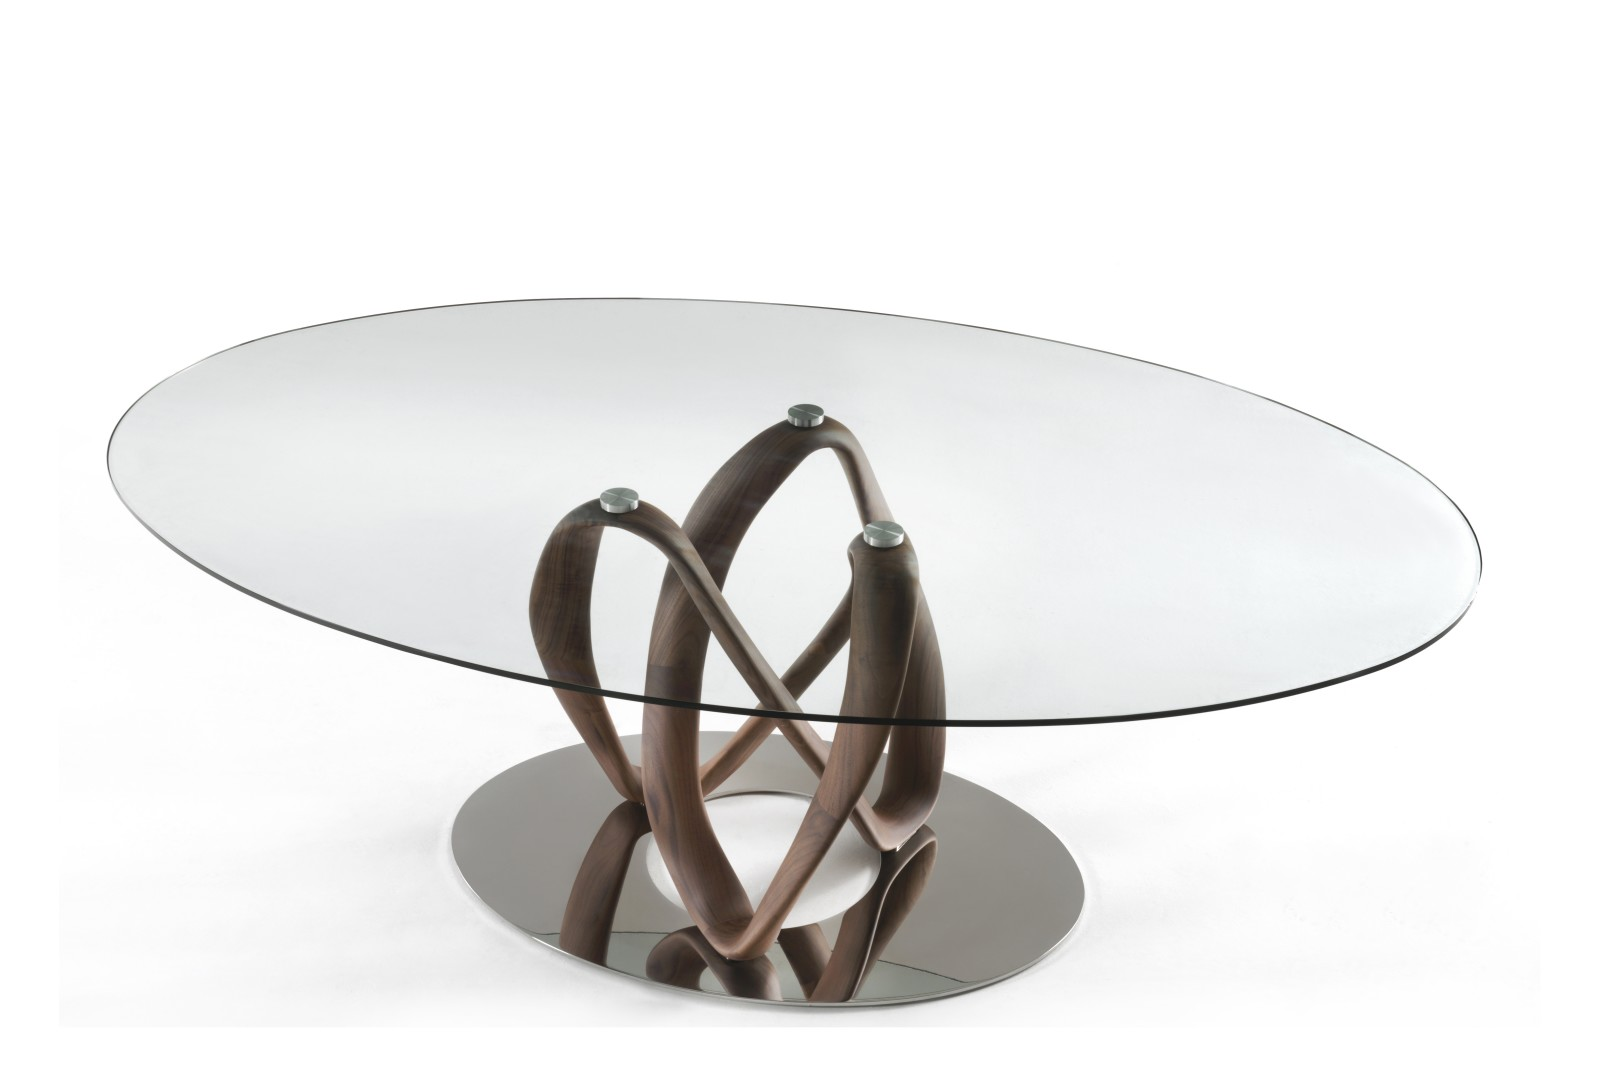 Infinity Dining Table 1 Base C, Ellittico Canaletta Walnut, Cristals Trasparente, Grey Petwer, 180cm